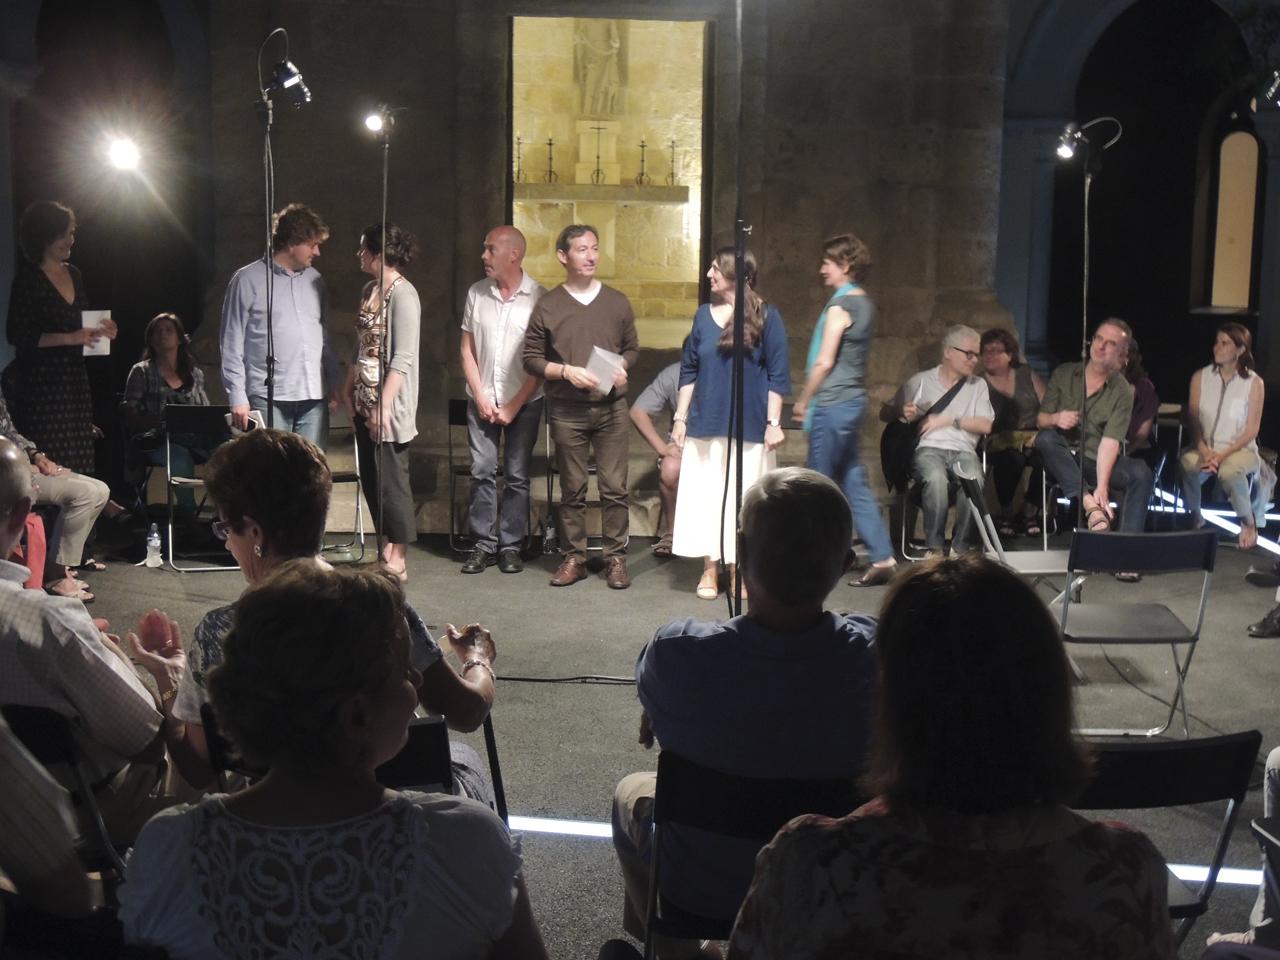 Els sis poetes, d'esquerra a dreta: Grégoire Polet, Aina Riera, Karel Logist, Josep Ballester, Tònia Passola i Caroline Coppé.